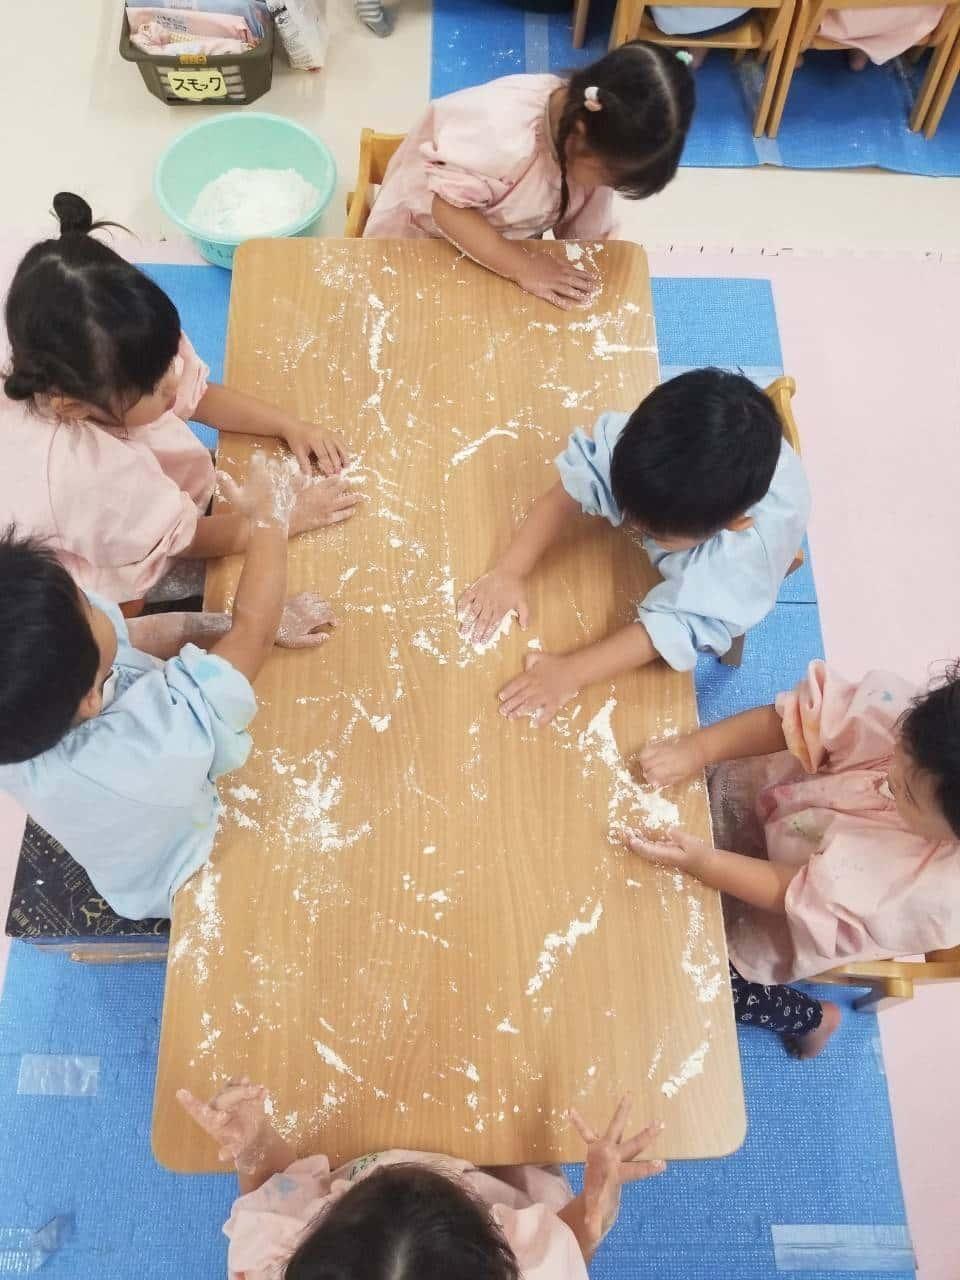 保護中: 8月お誕生日会🎂室内遊び🎐 長岡京園 キャッチ画像